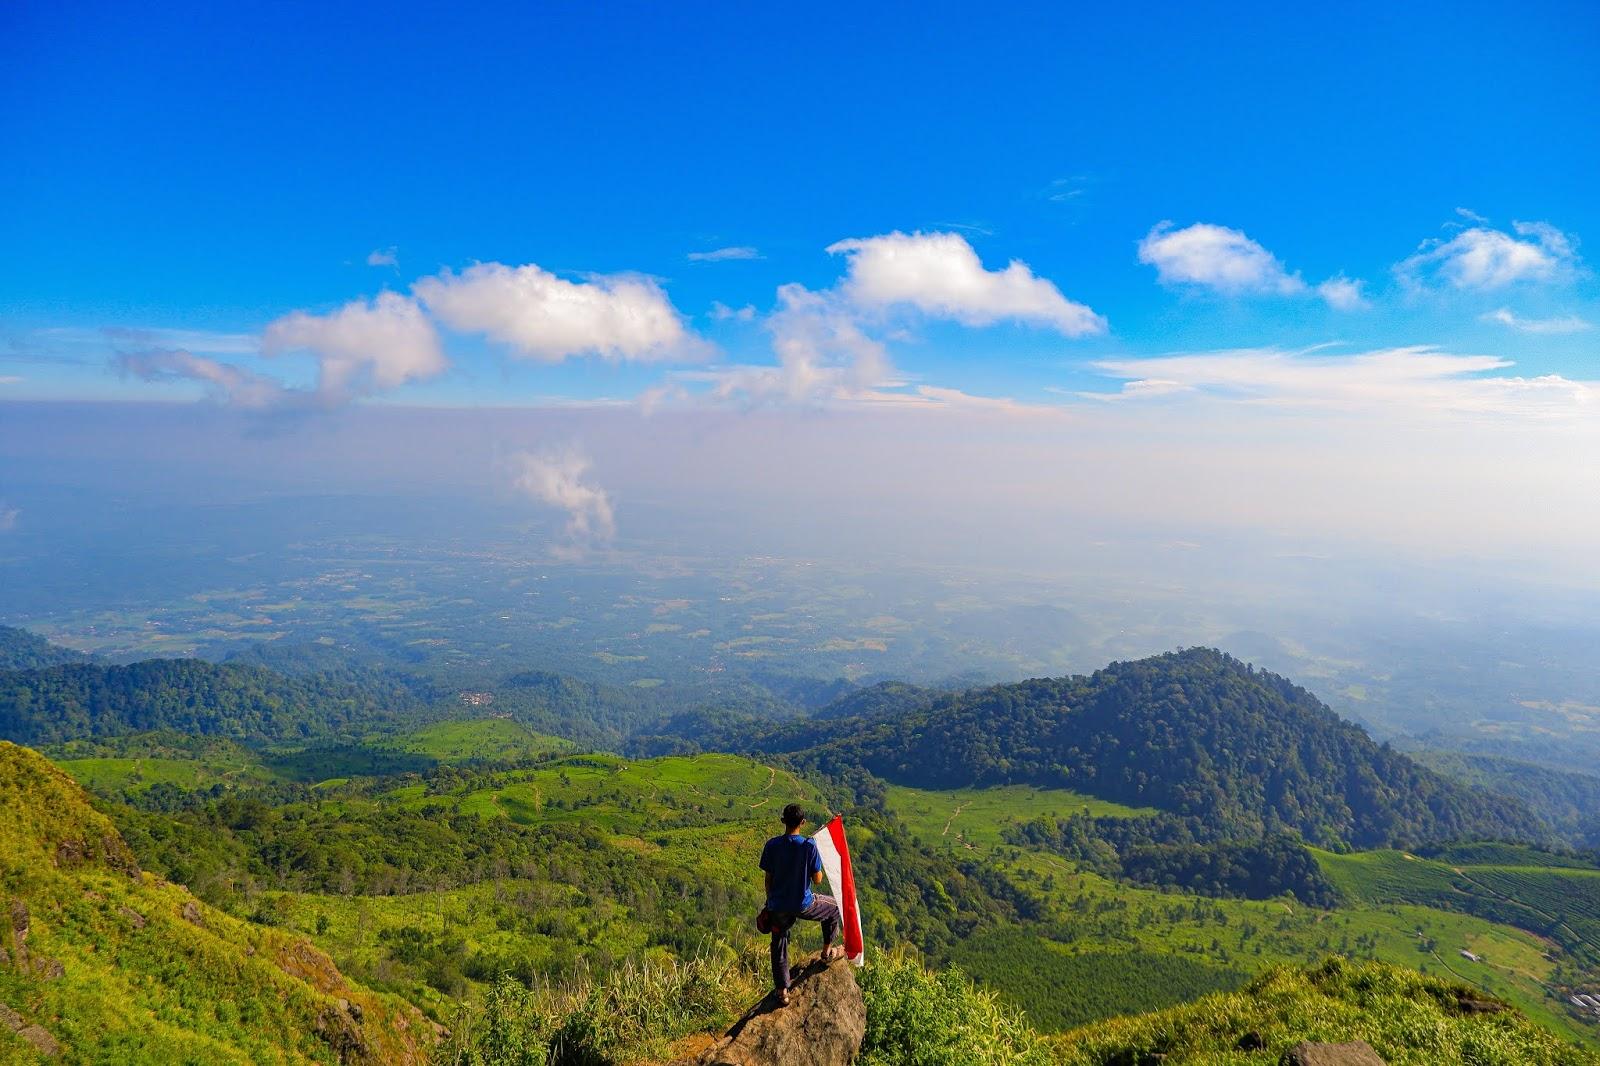 gunung ungaran view